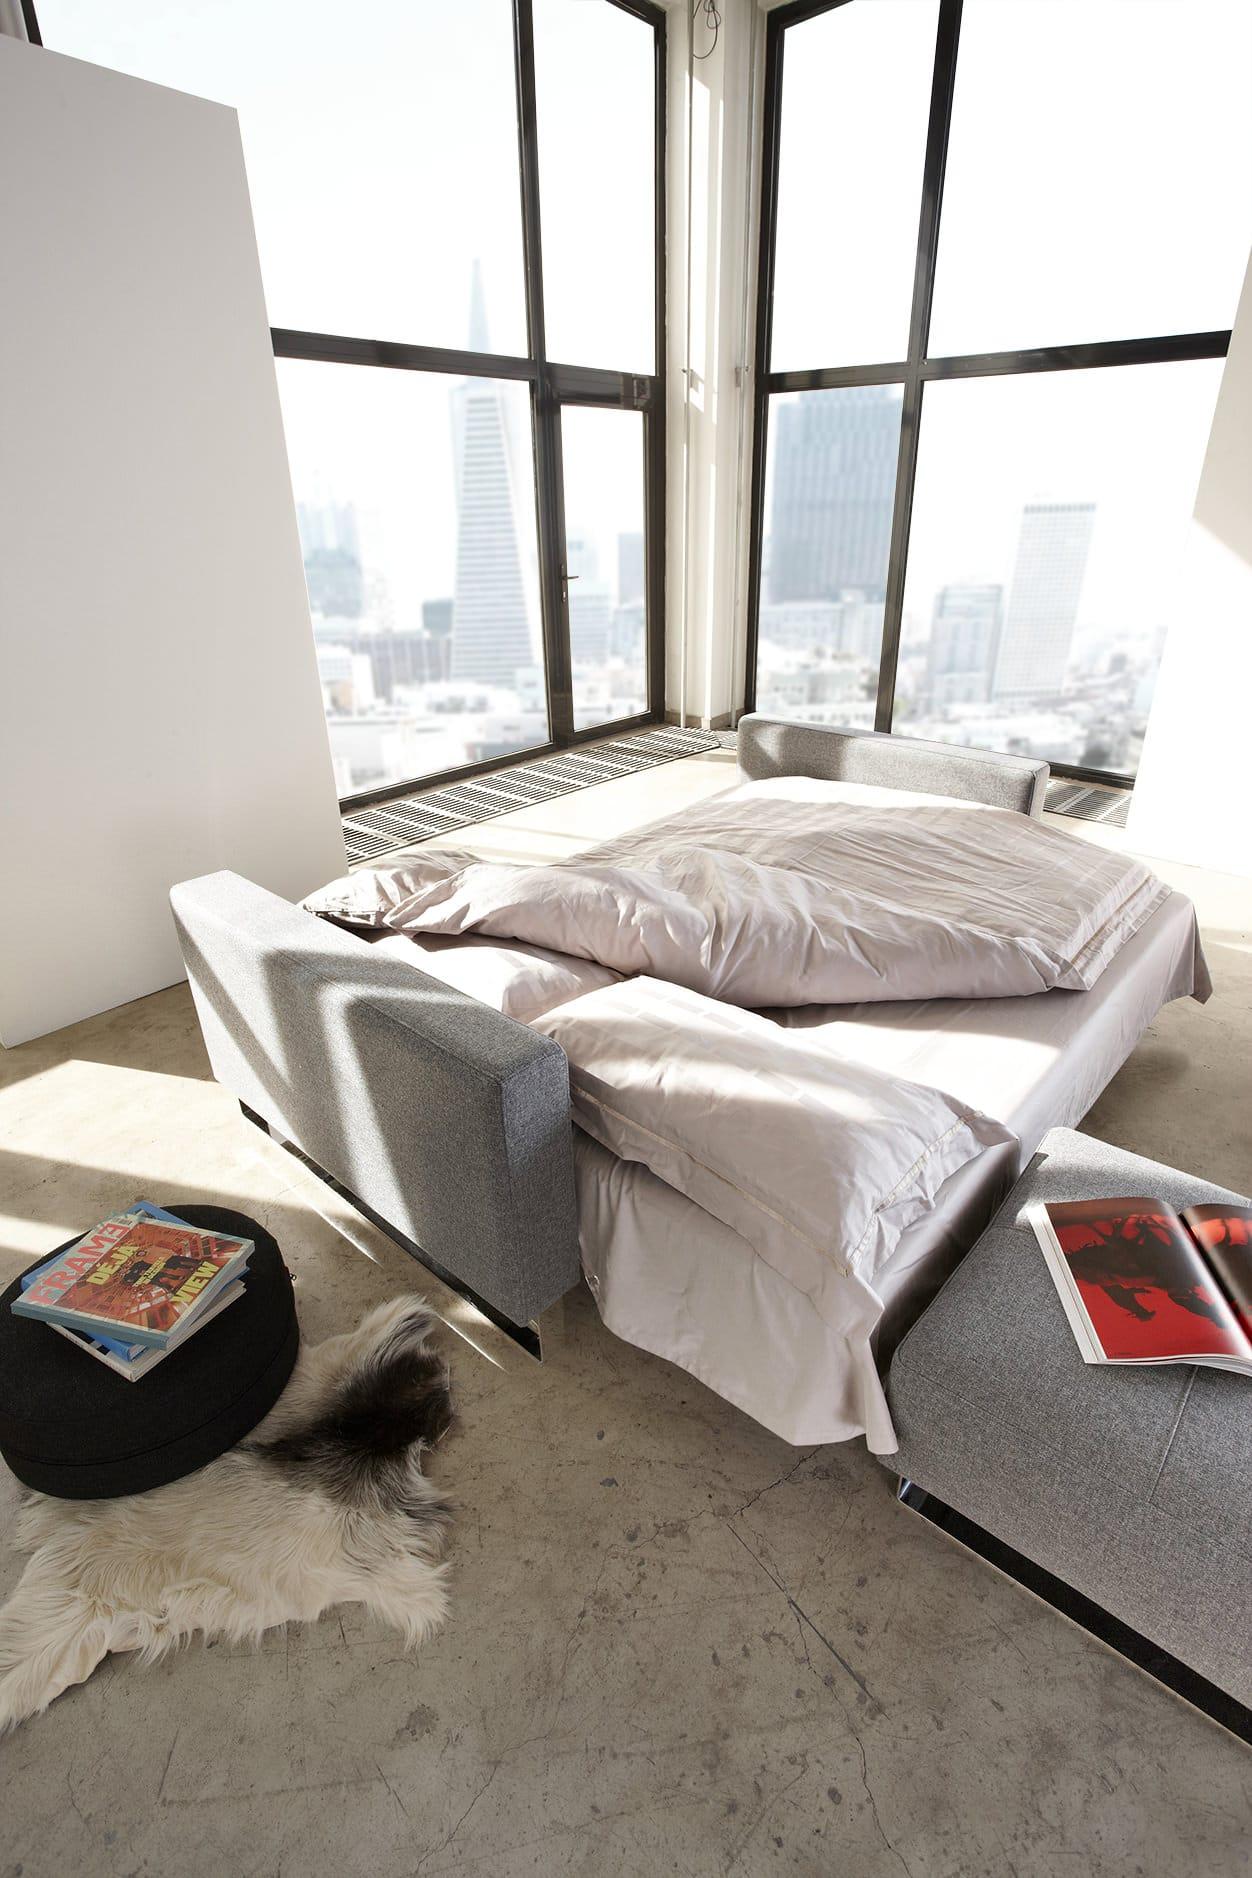 solsta sofa bed ransta dark gray 149 00 sectional sofas sale cassius deluxe excess queen size mixed dance